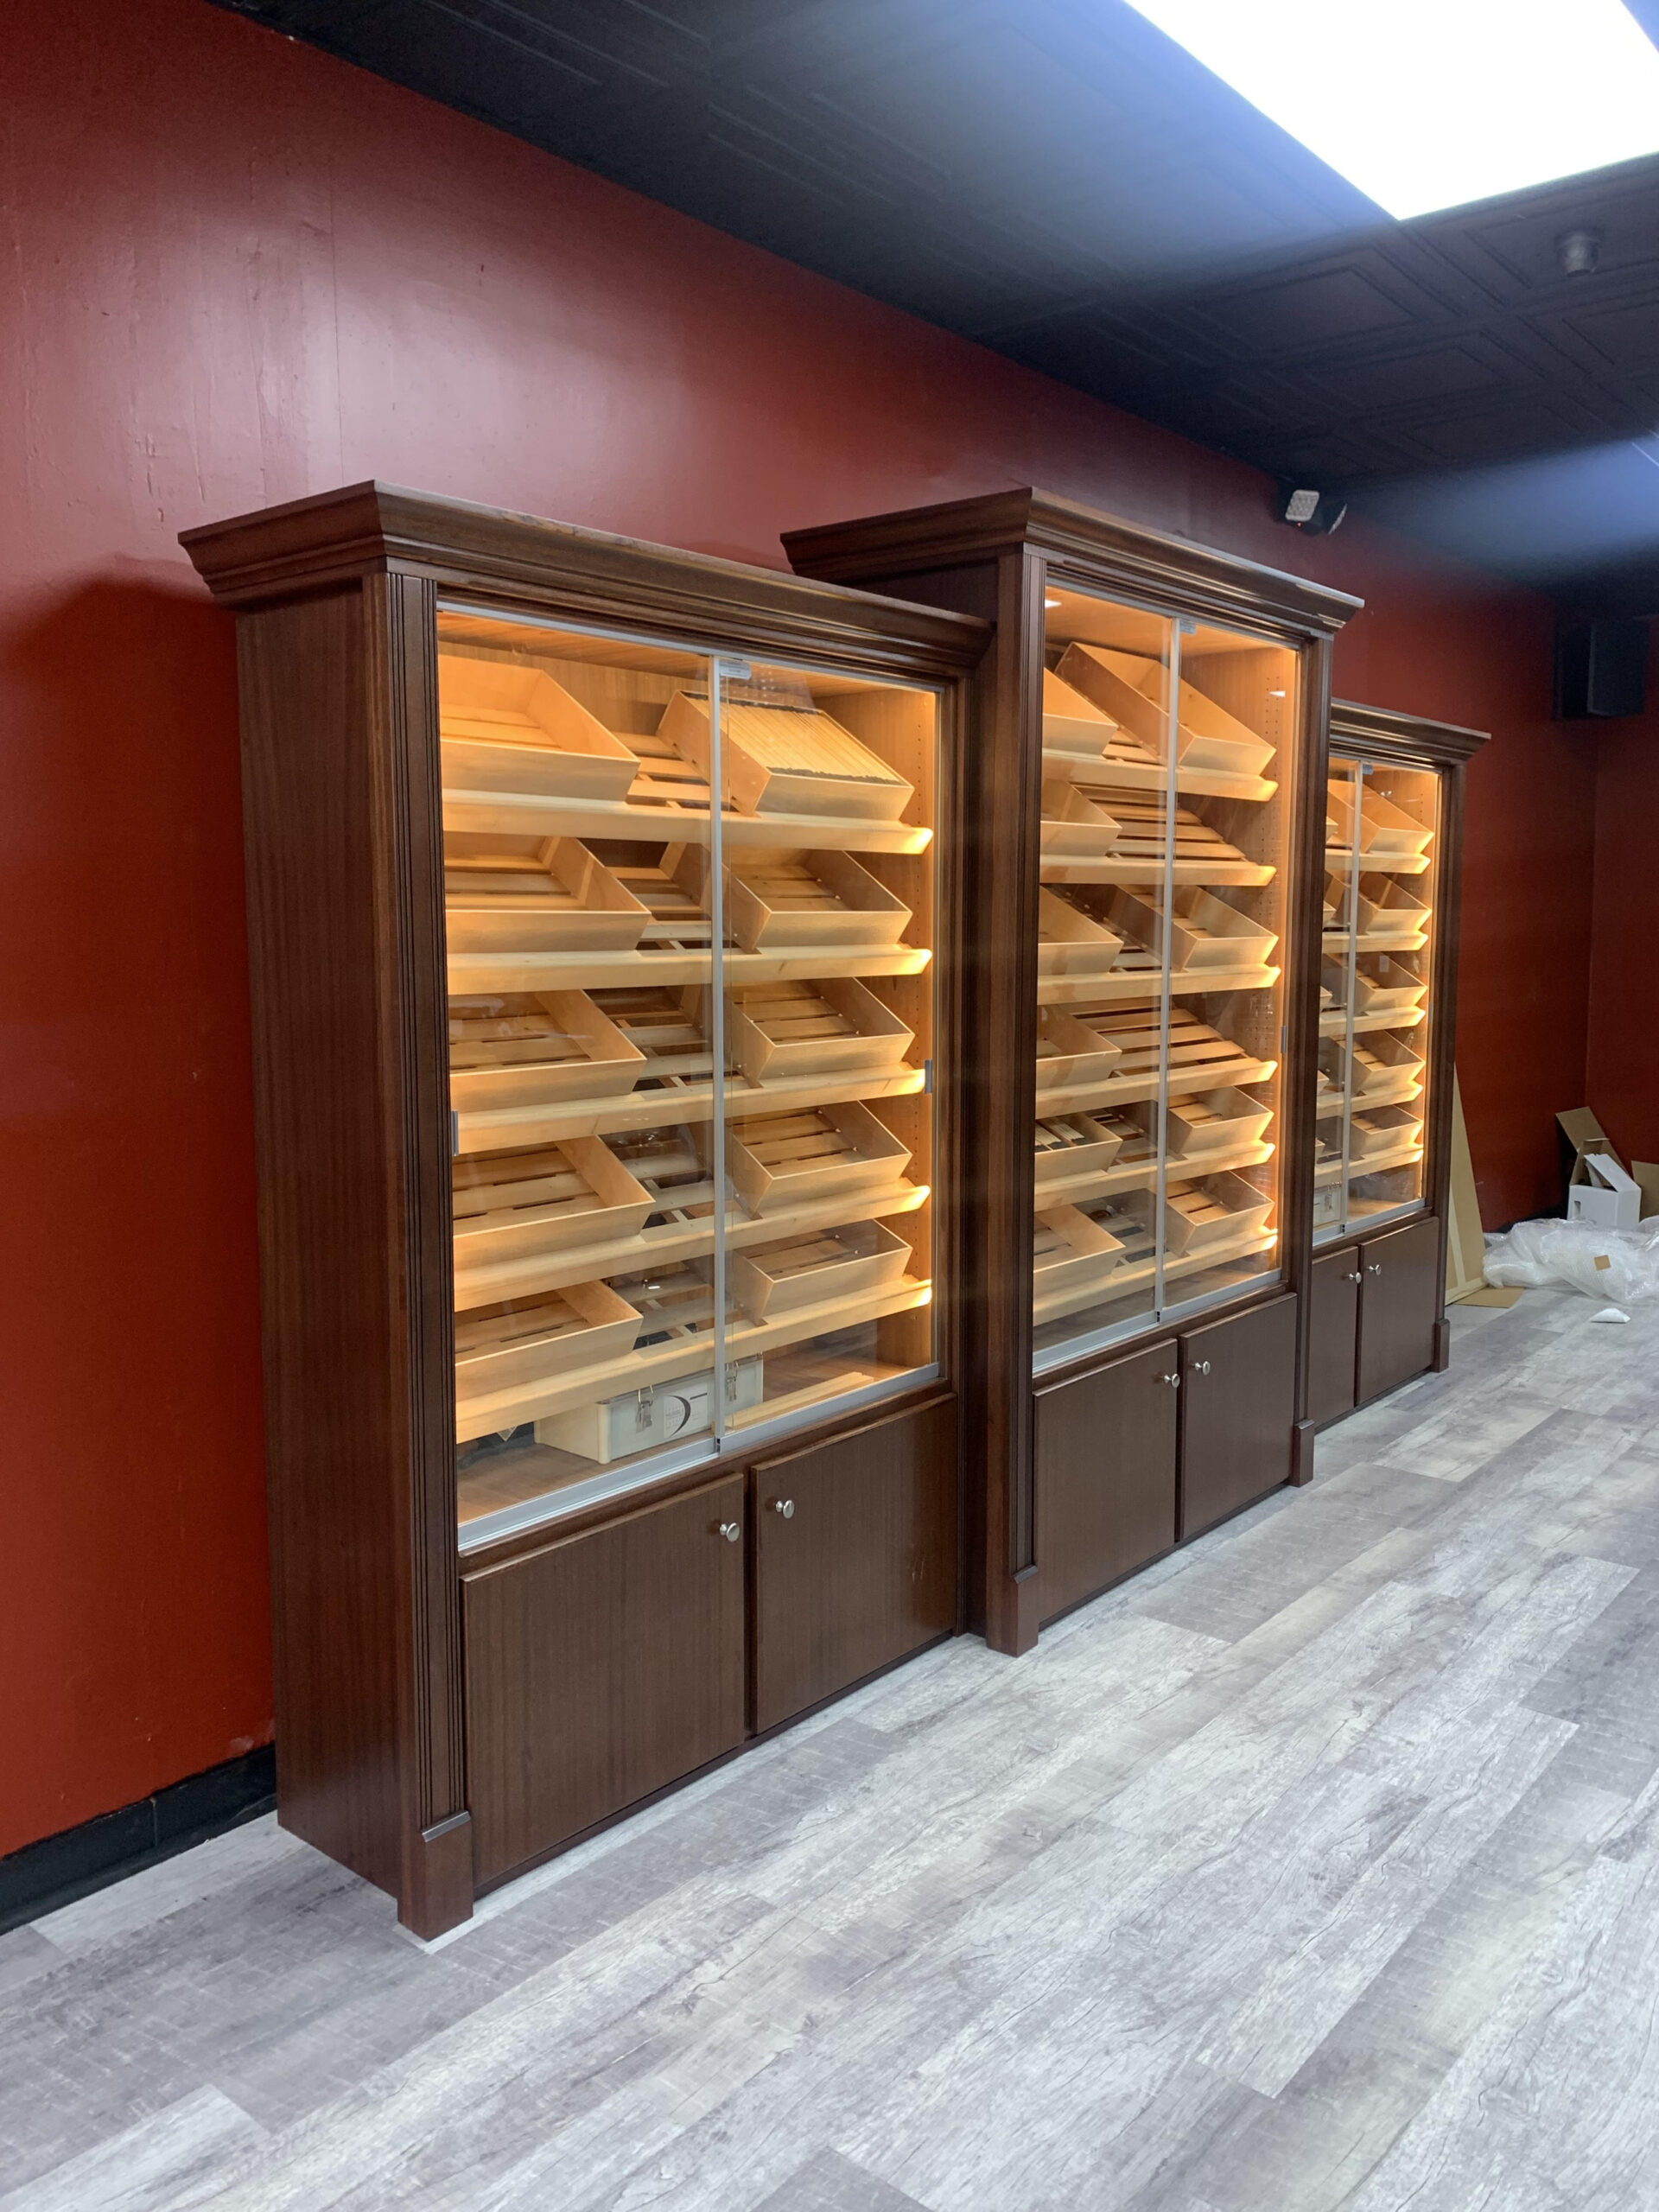 Mr. Garcia Cigars – Bergen, NJ